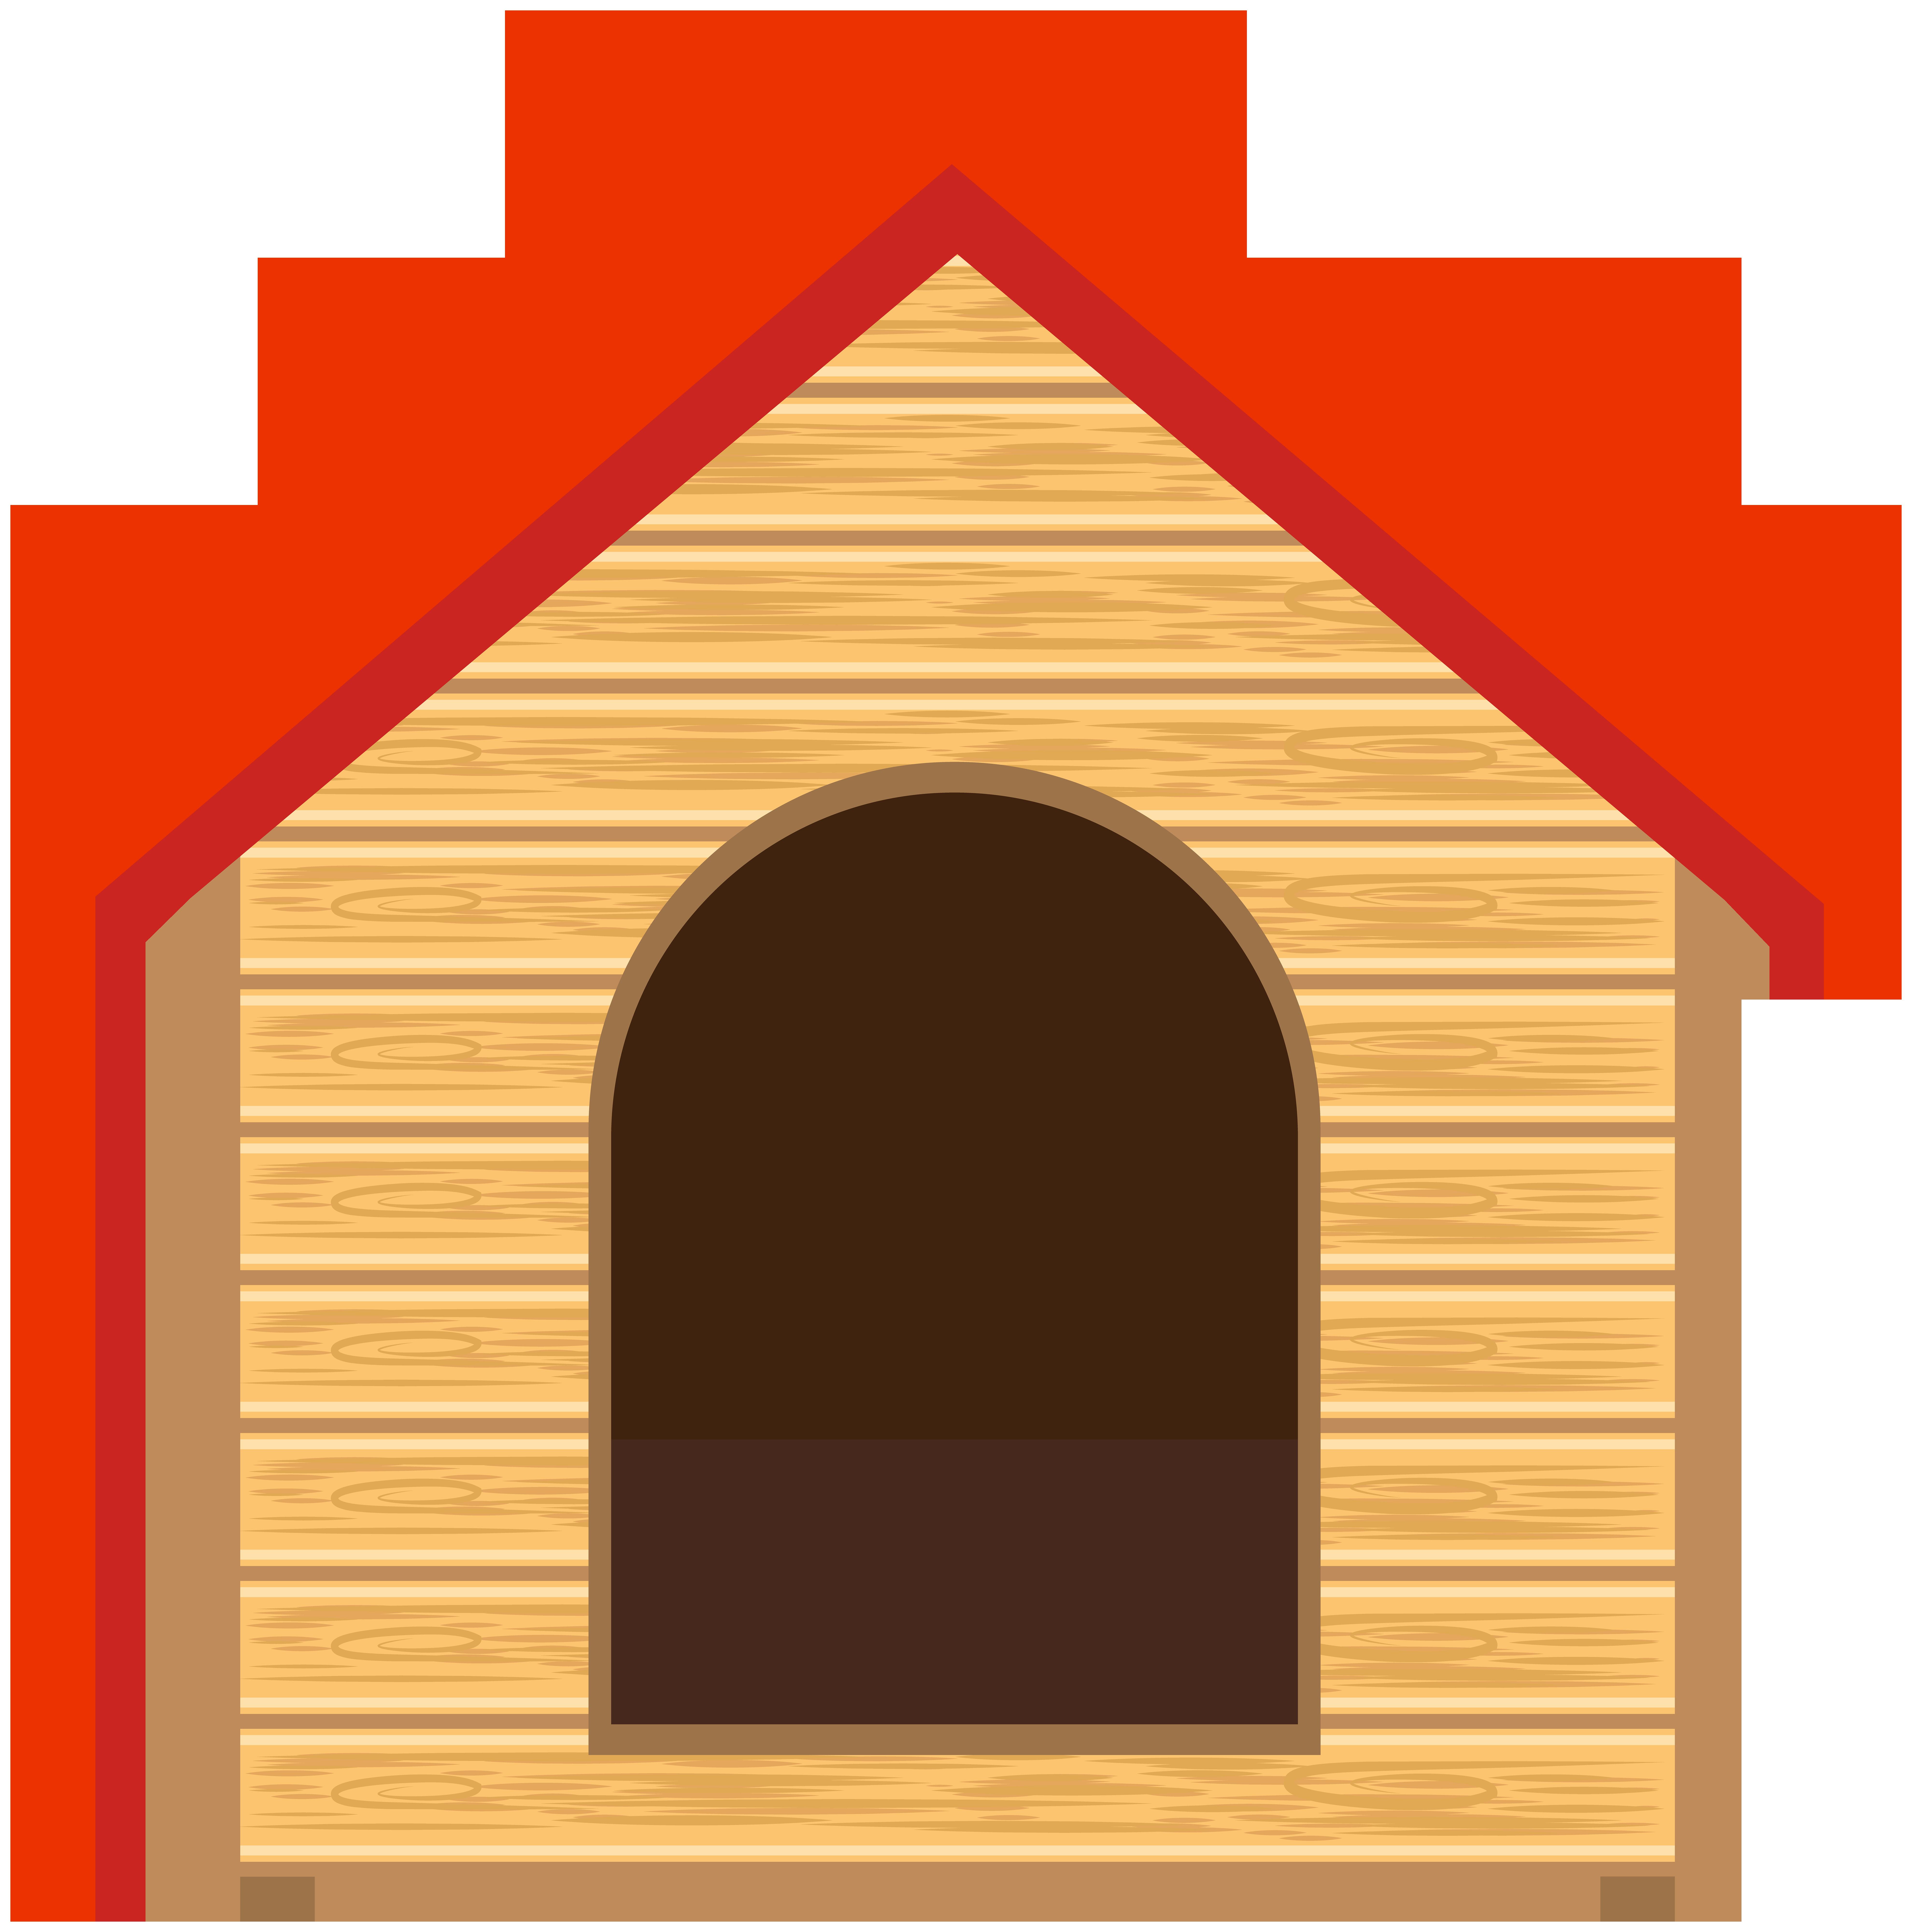 Dog houses clip art. Doghouse clipart hut house